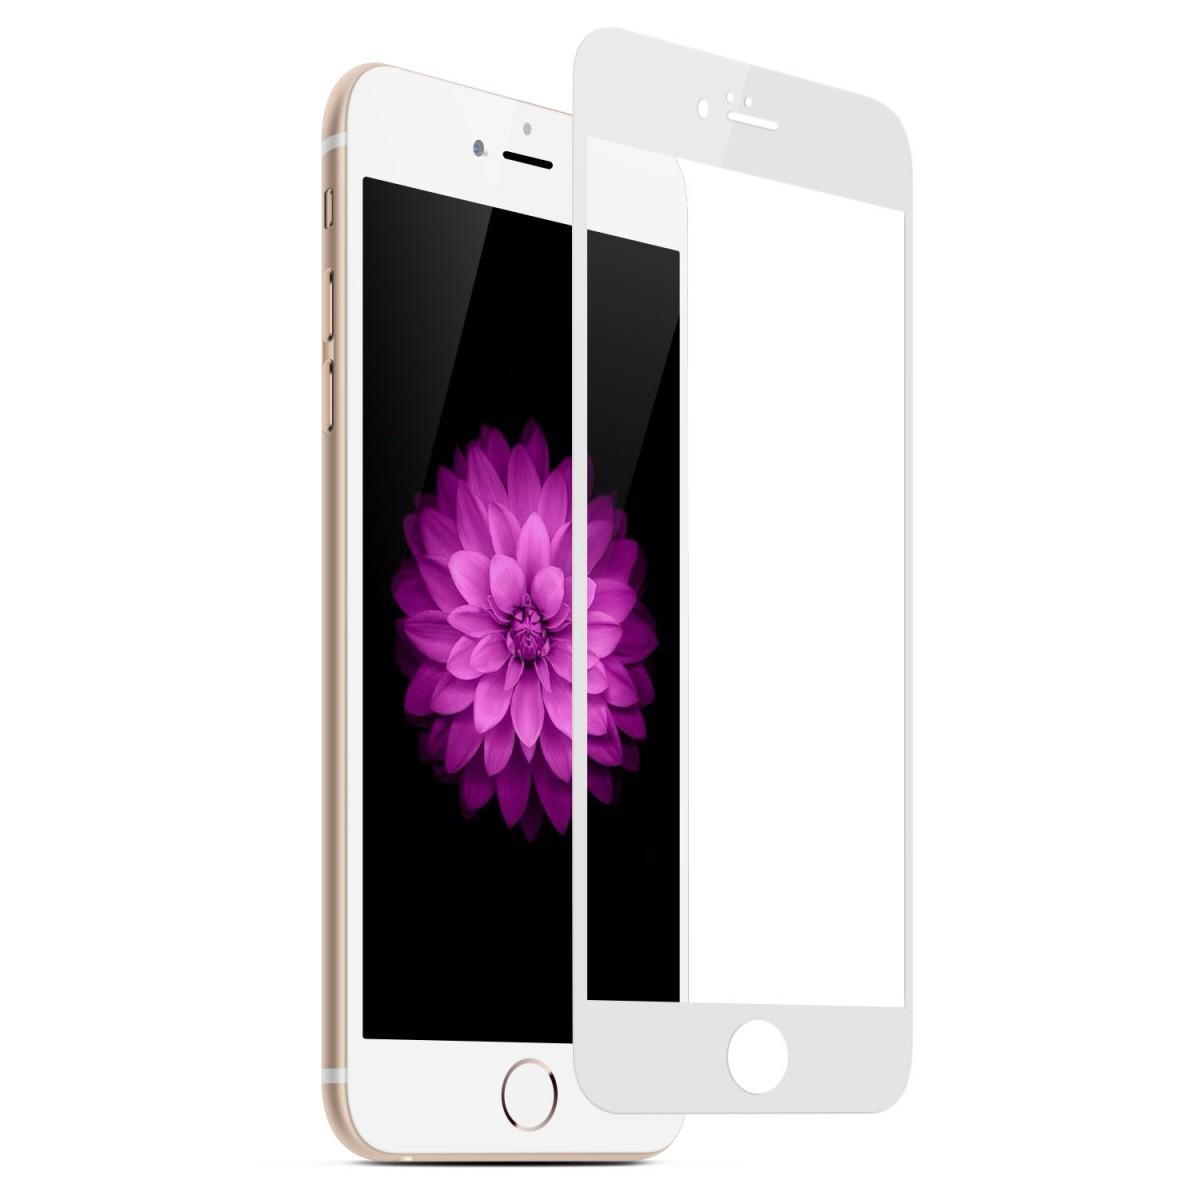 Tvrzené sklo FullCover na iPhone 6s Plus/ 6 Plus (bílé)